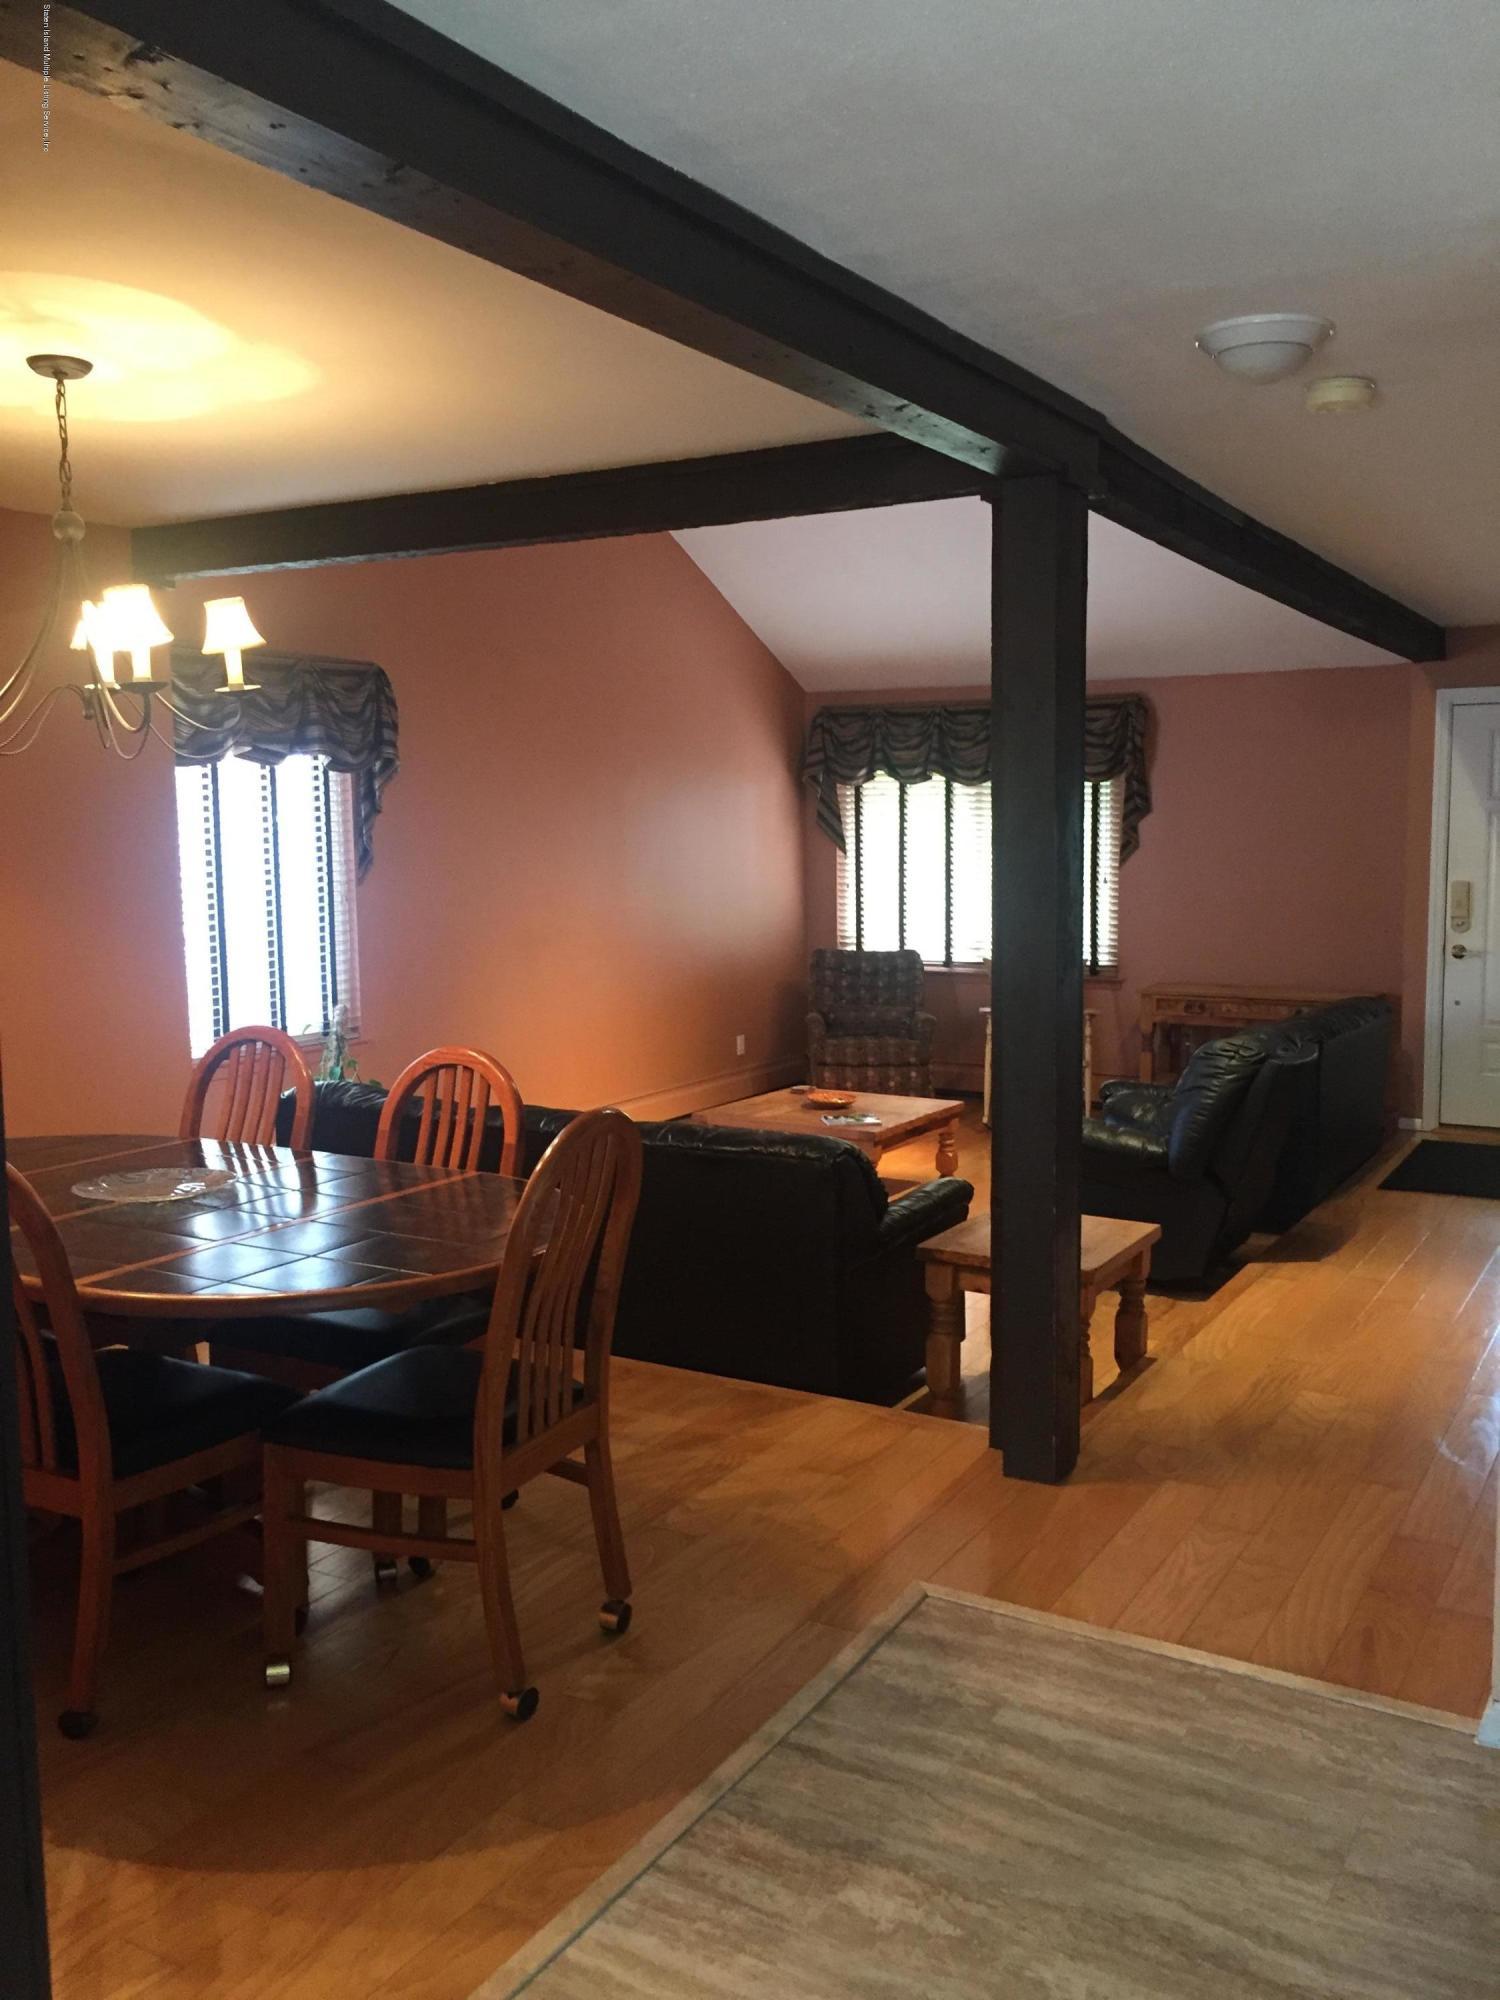 Single Family - Detached 46 Forrestal Avenue  Staten Island, NY 10312, MLS-1131922-10